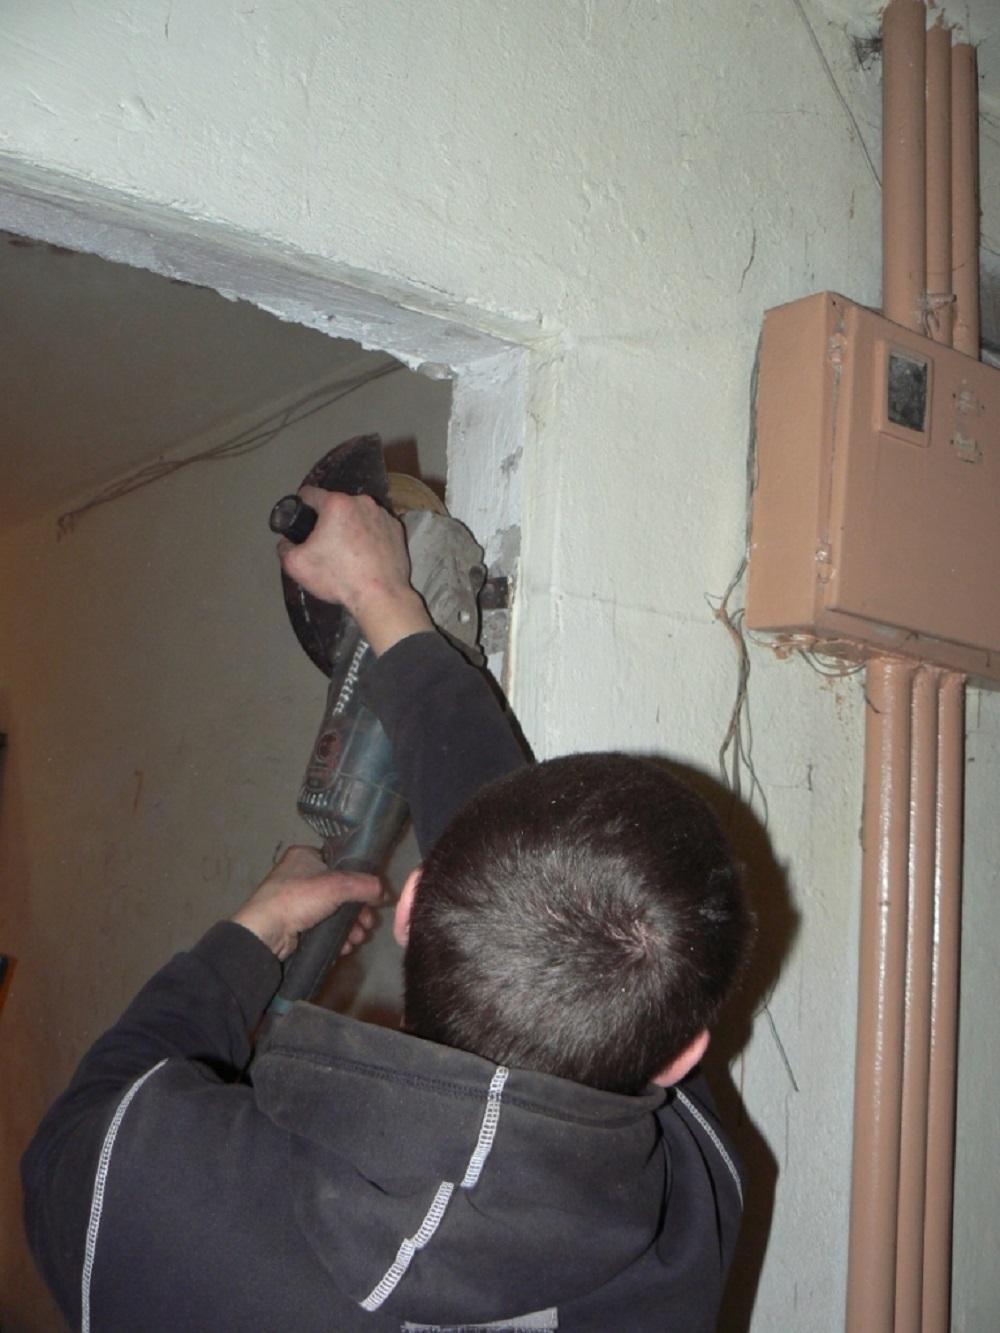 ustanovka-vhodnoj-dveri-svoimi-rukami-instrukcija_9_1